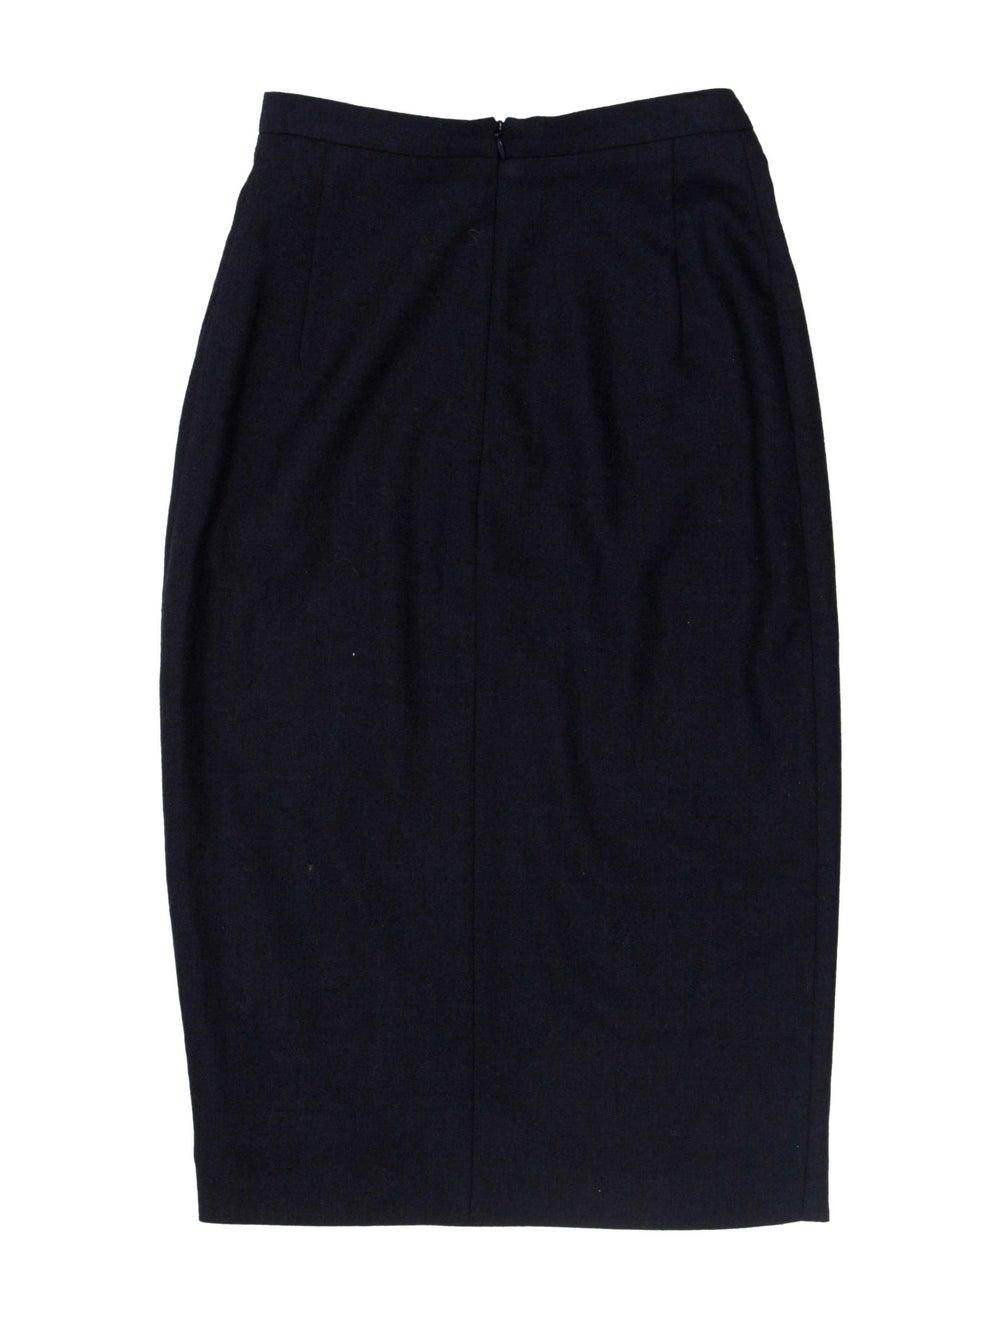 Altuzarra Midi Skirt Navy - image 2